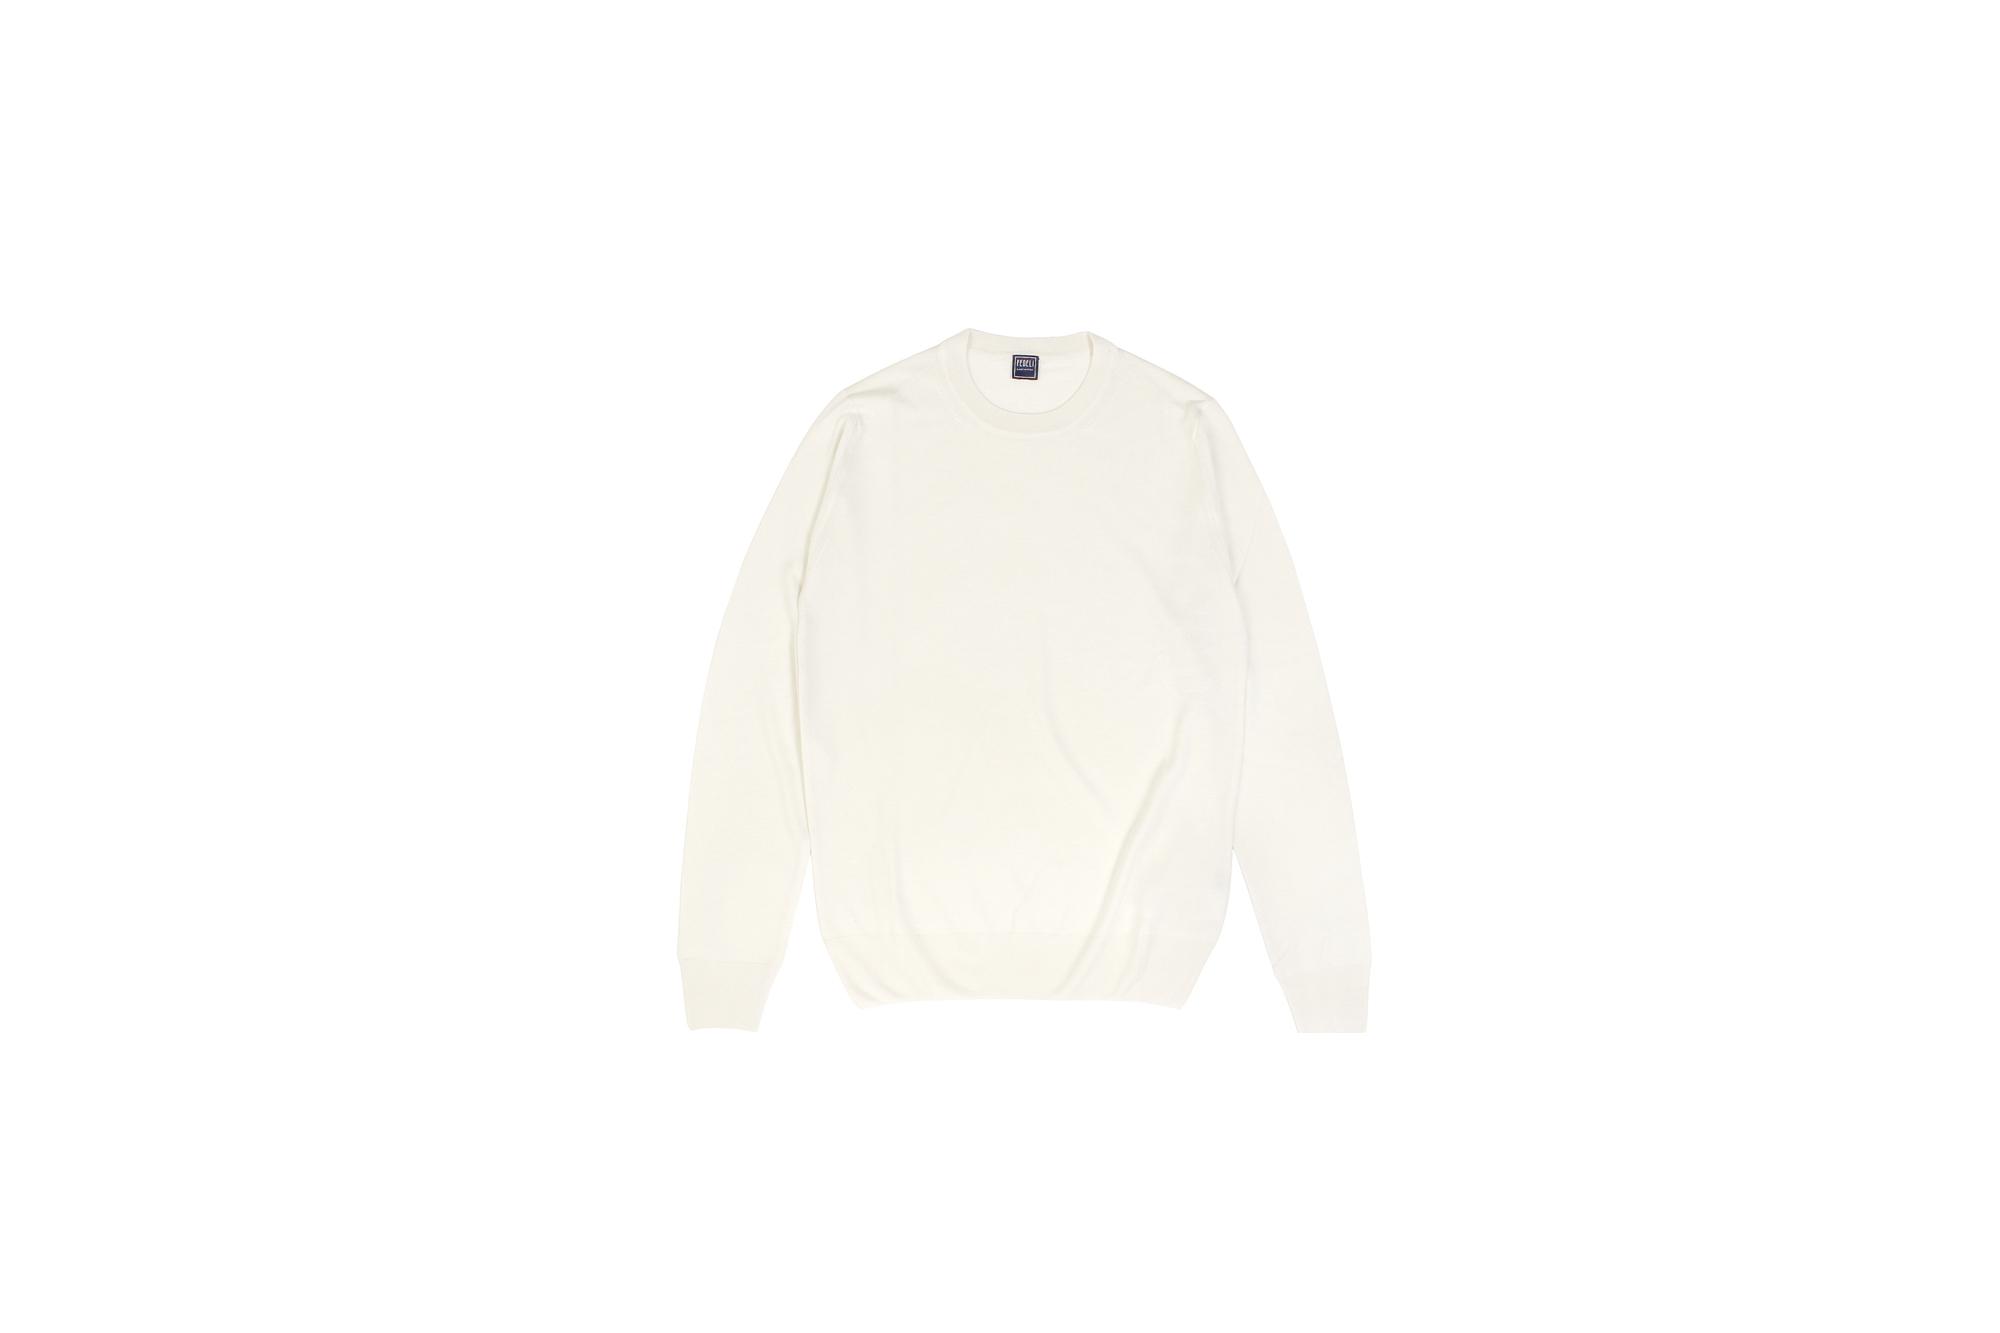 FEDELI (フェデリ) Silk Cashmere Crew Neck Sweater シルクカシミア クルーネック セーター WHITE (ホワイト・22) made in italy (イタリア製) 2021 秋冬新作 【入荷しました】【フリー分発売開始】愛知 名古屋 Alto e Diritto altoediritto アルトエデリット シルカシニット